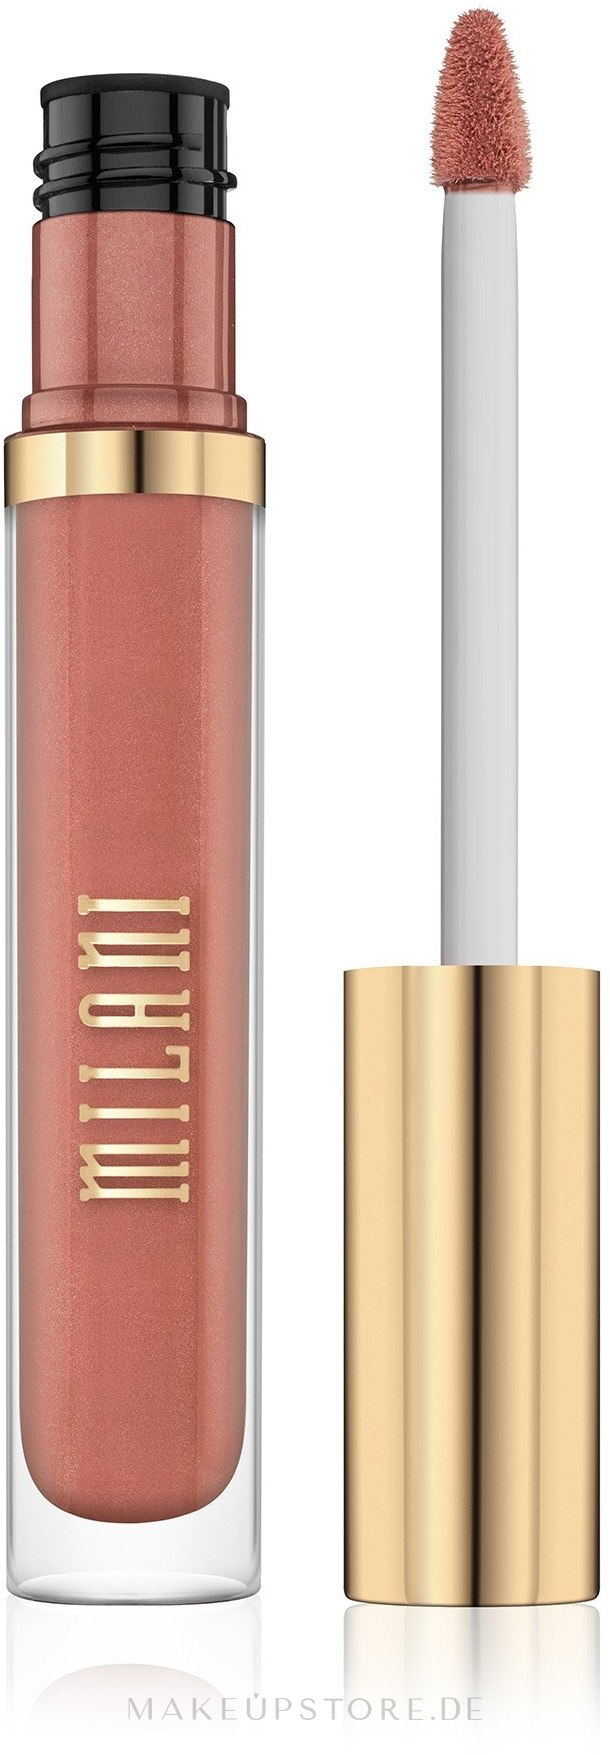 Flüssiger Lippenstift - Milani Amore Shine Liquid Lip Color — Bild 01 - Delight